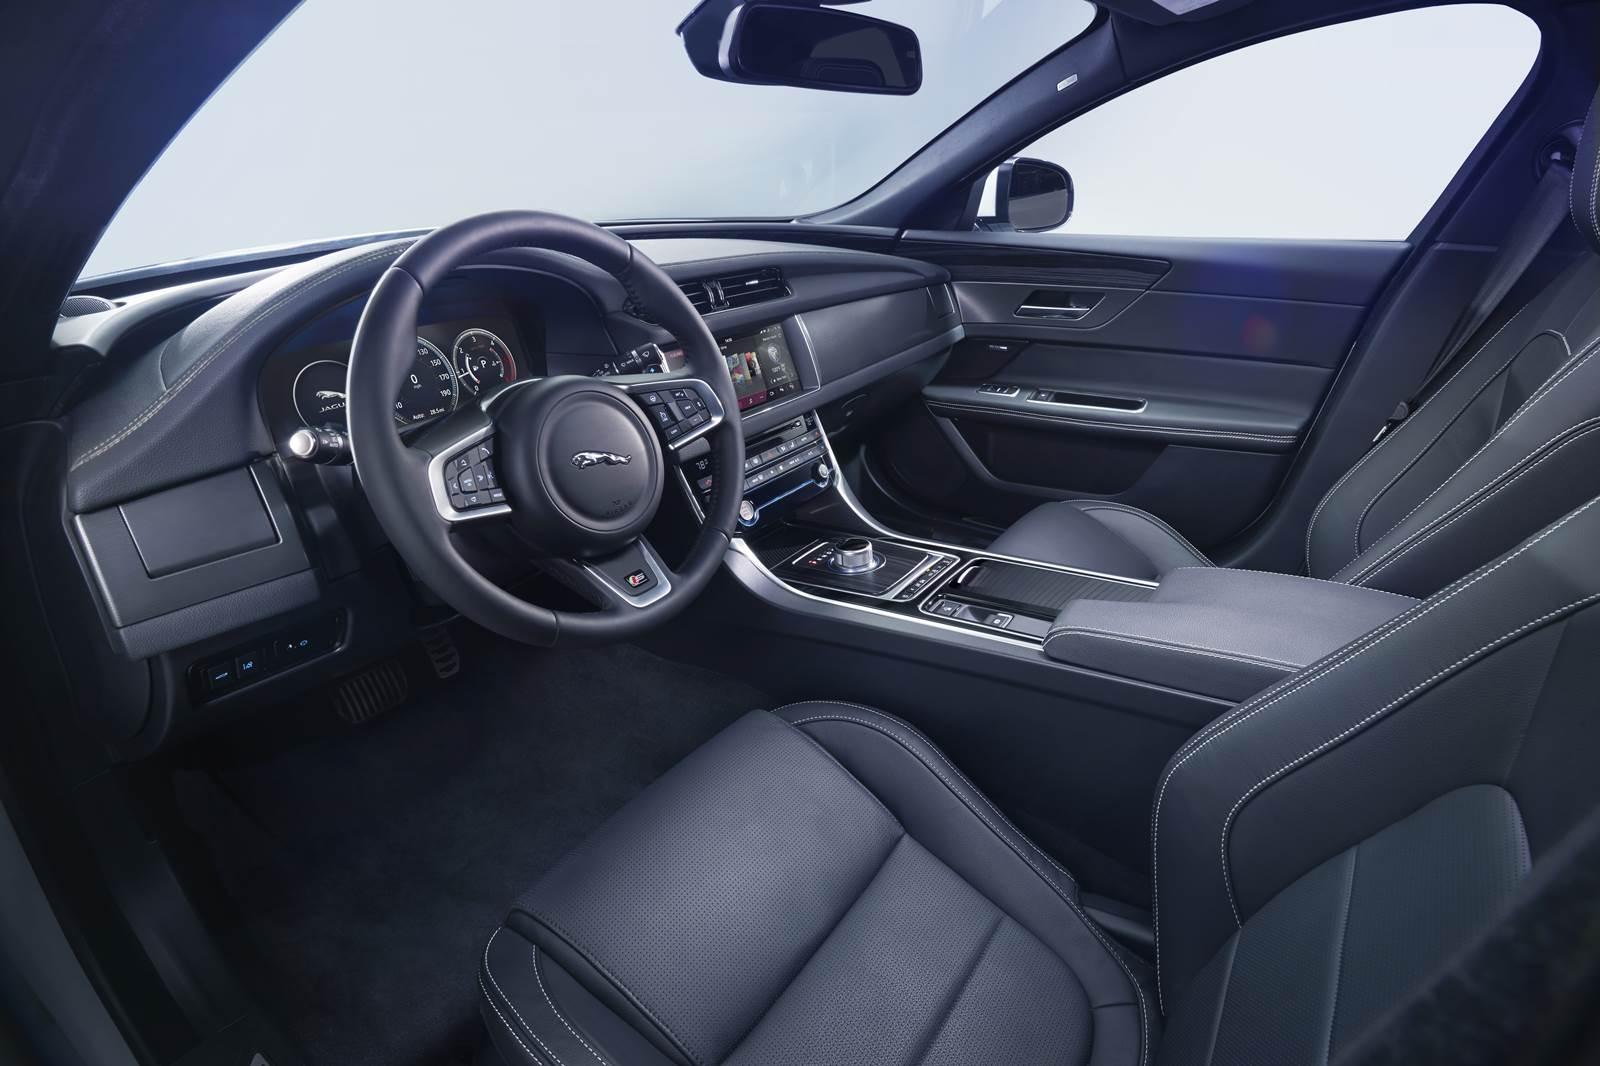 Novo Jaguar XF 2016 - interior